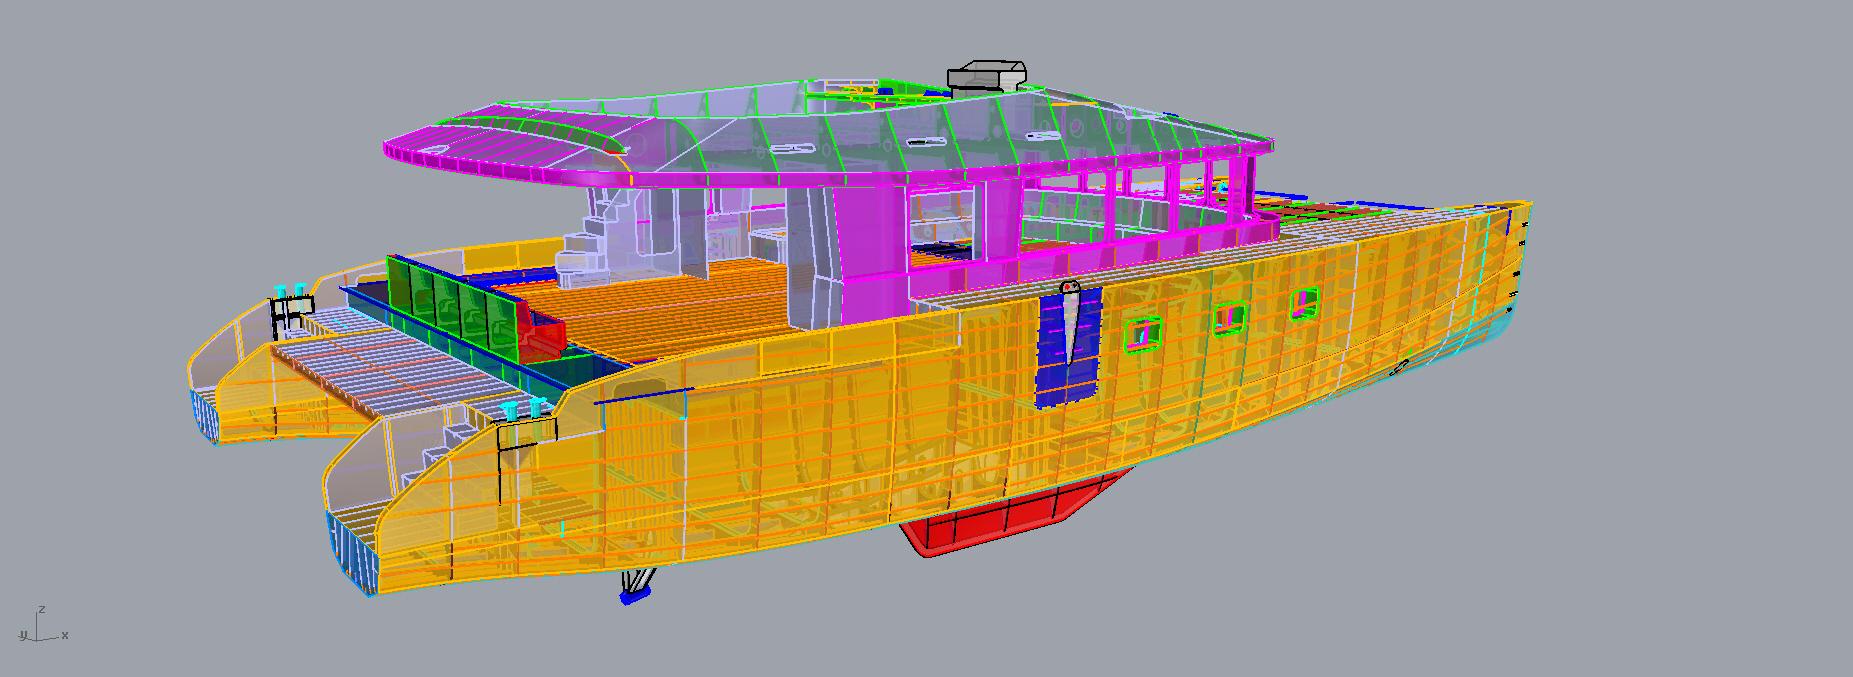 3D digital mock-up for 21m sail cat